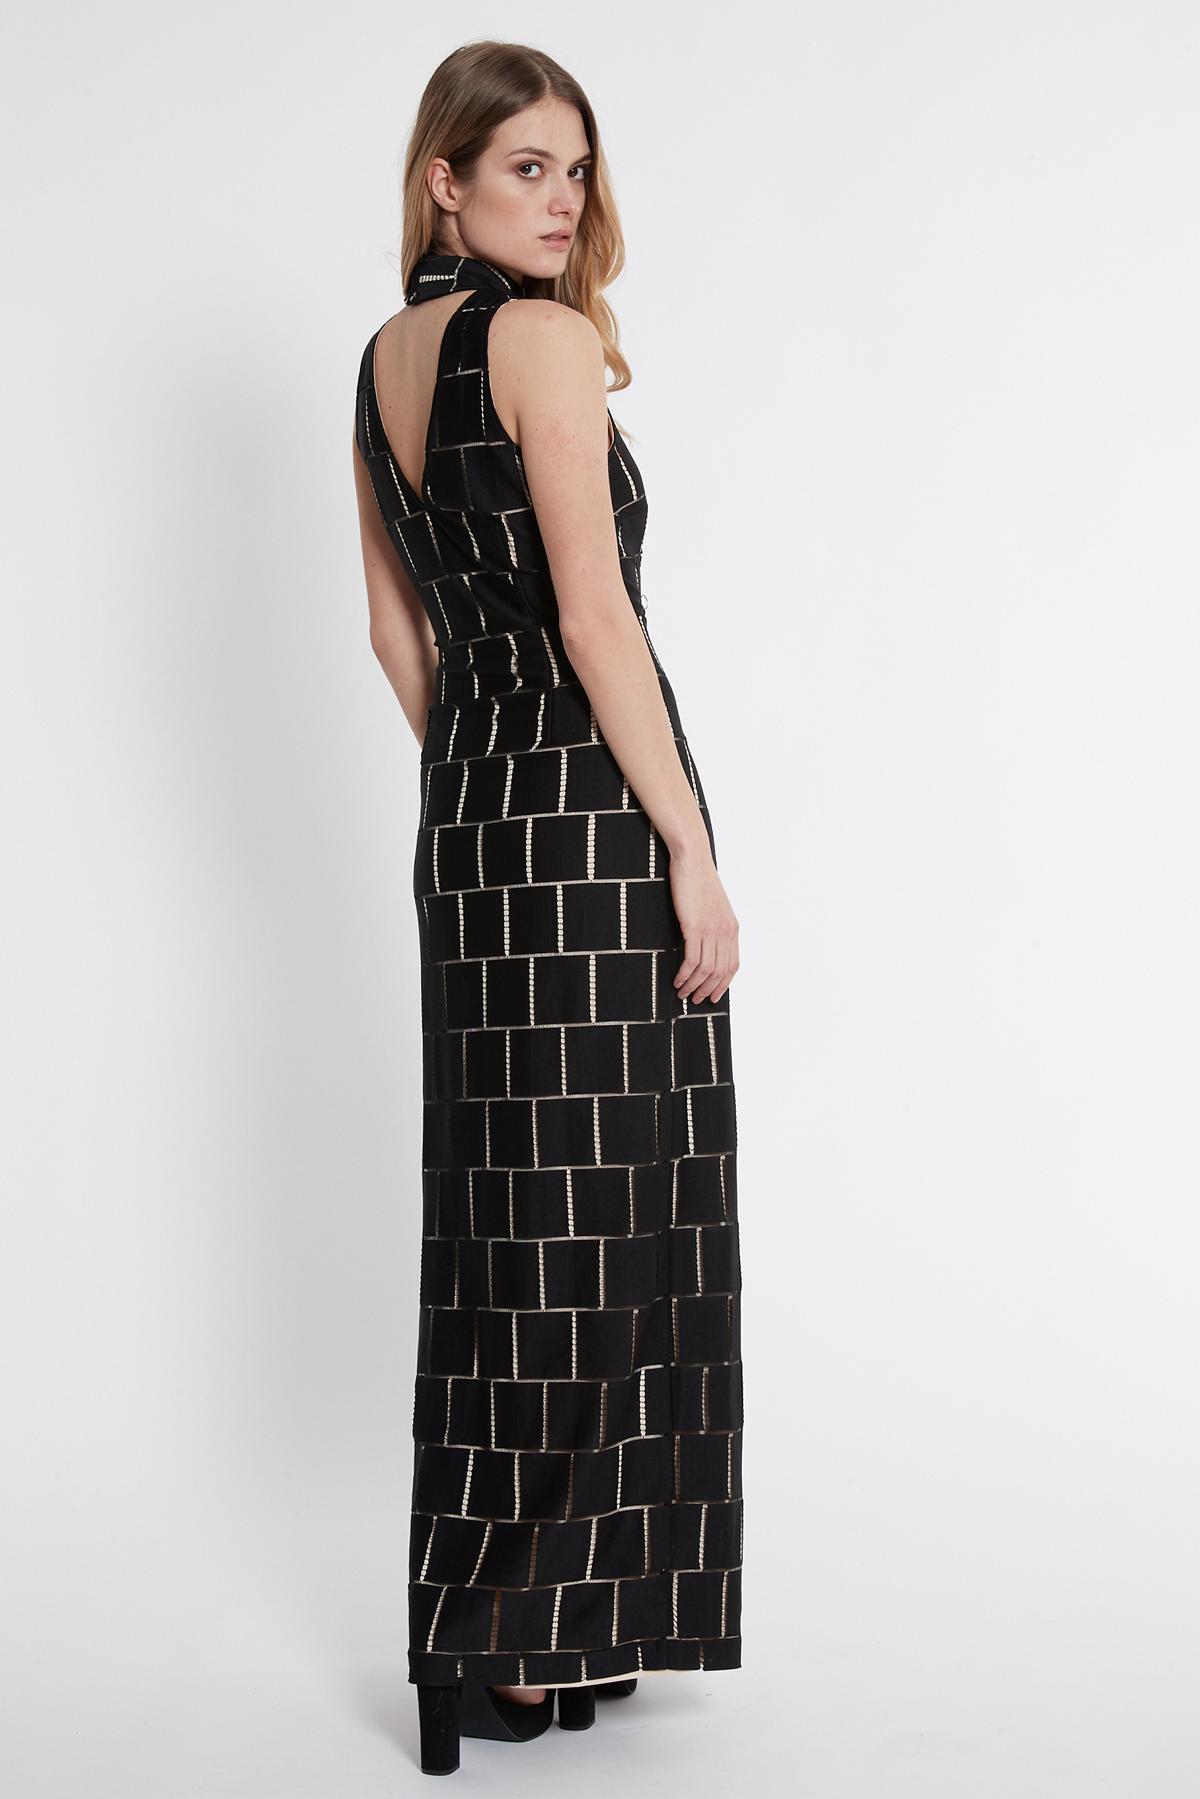 Achteraanzicht van Ana Alcazar Maxi Jurk Saminty Wit  gedragen per model